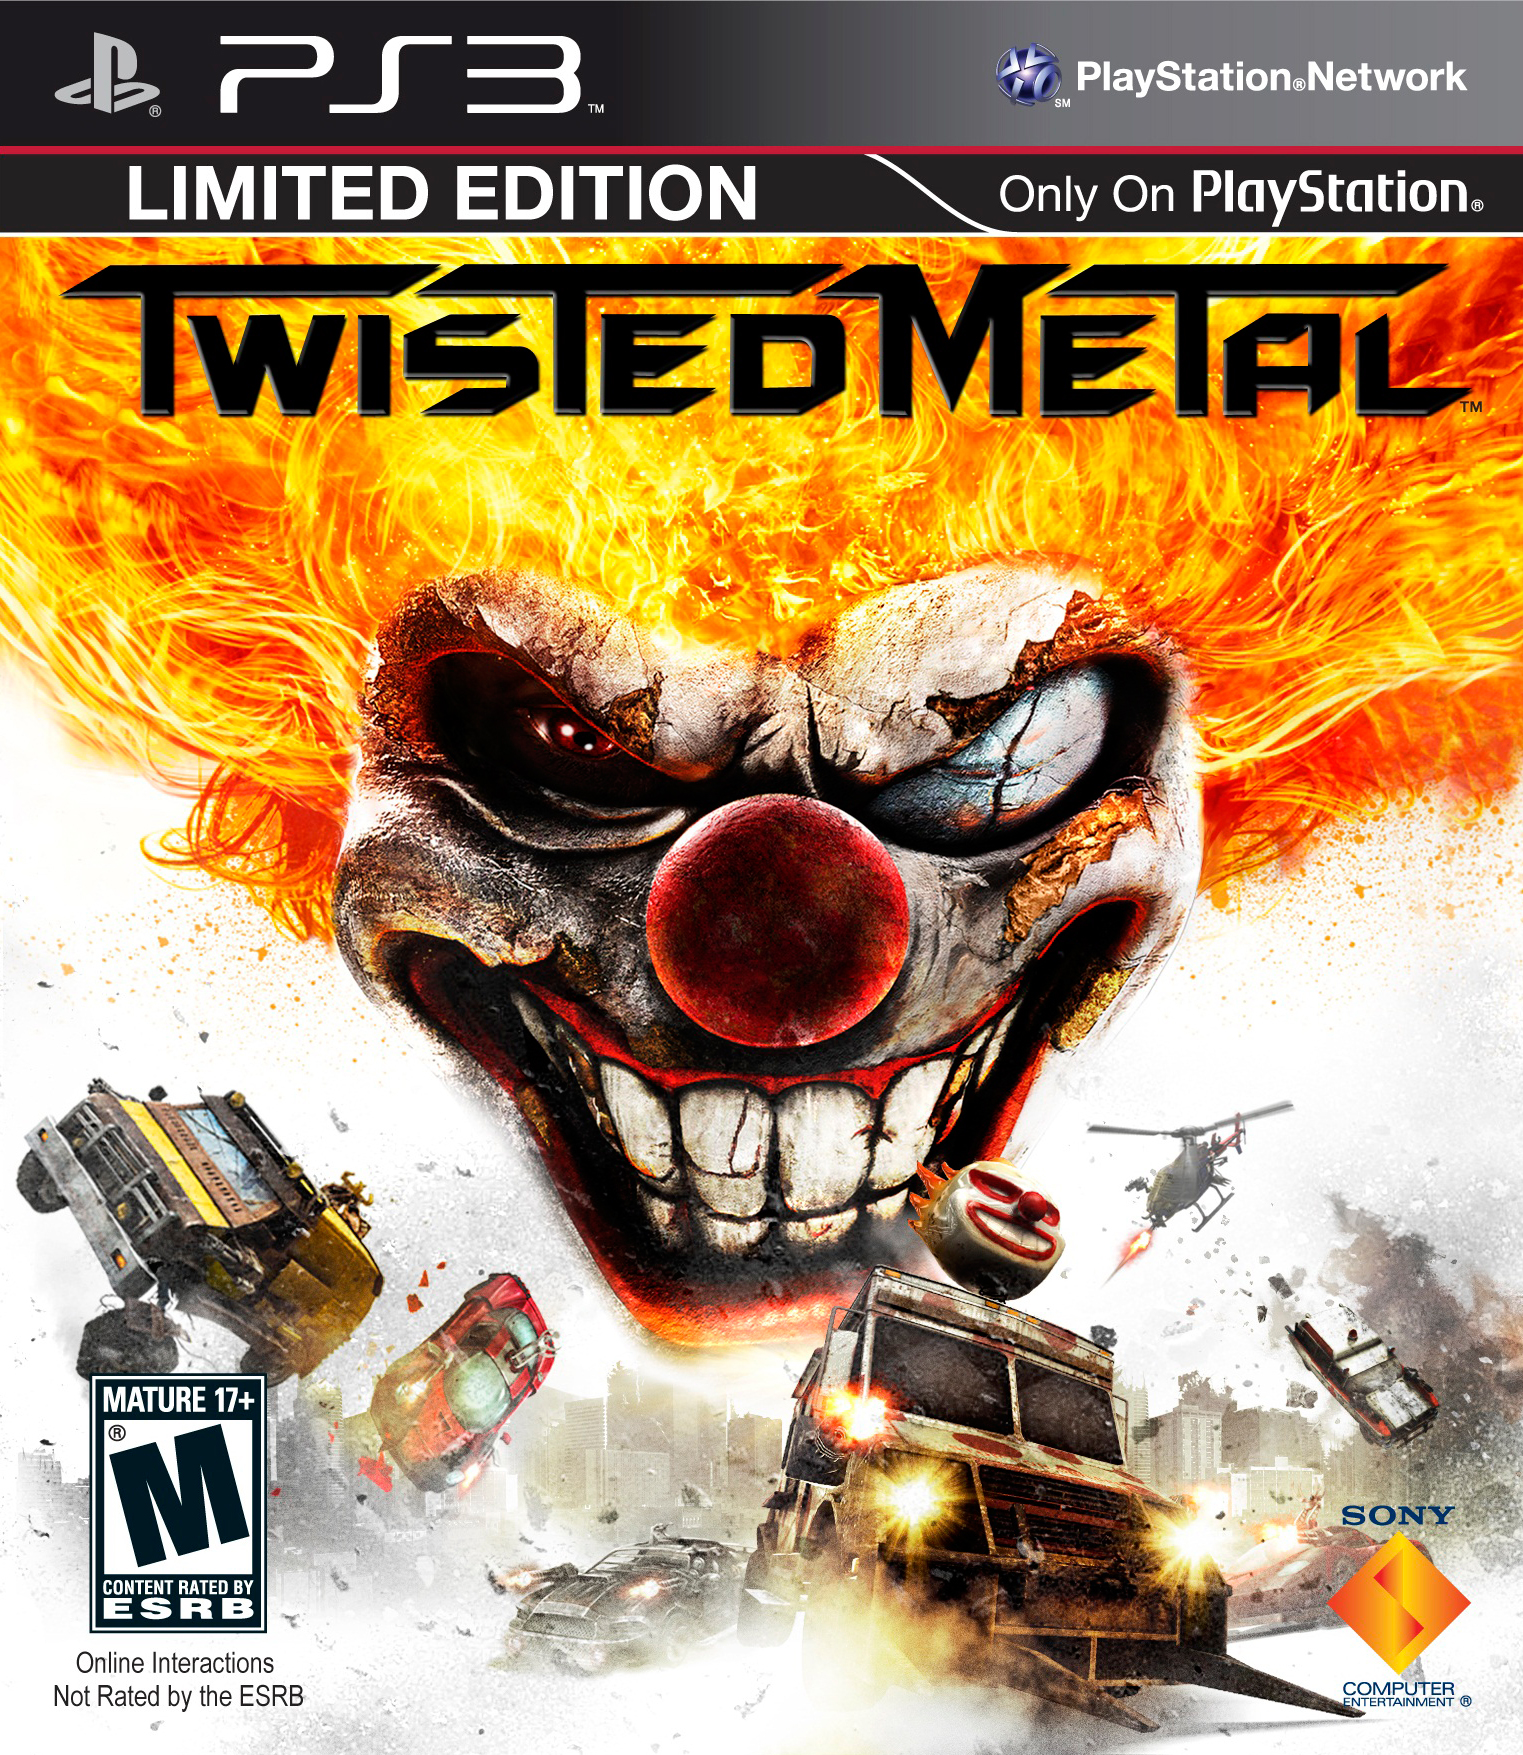 Twisted Metal - IGN.com